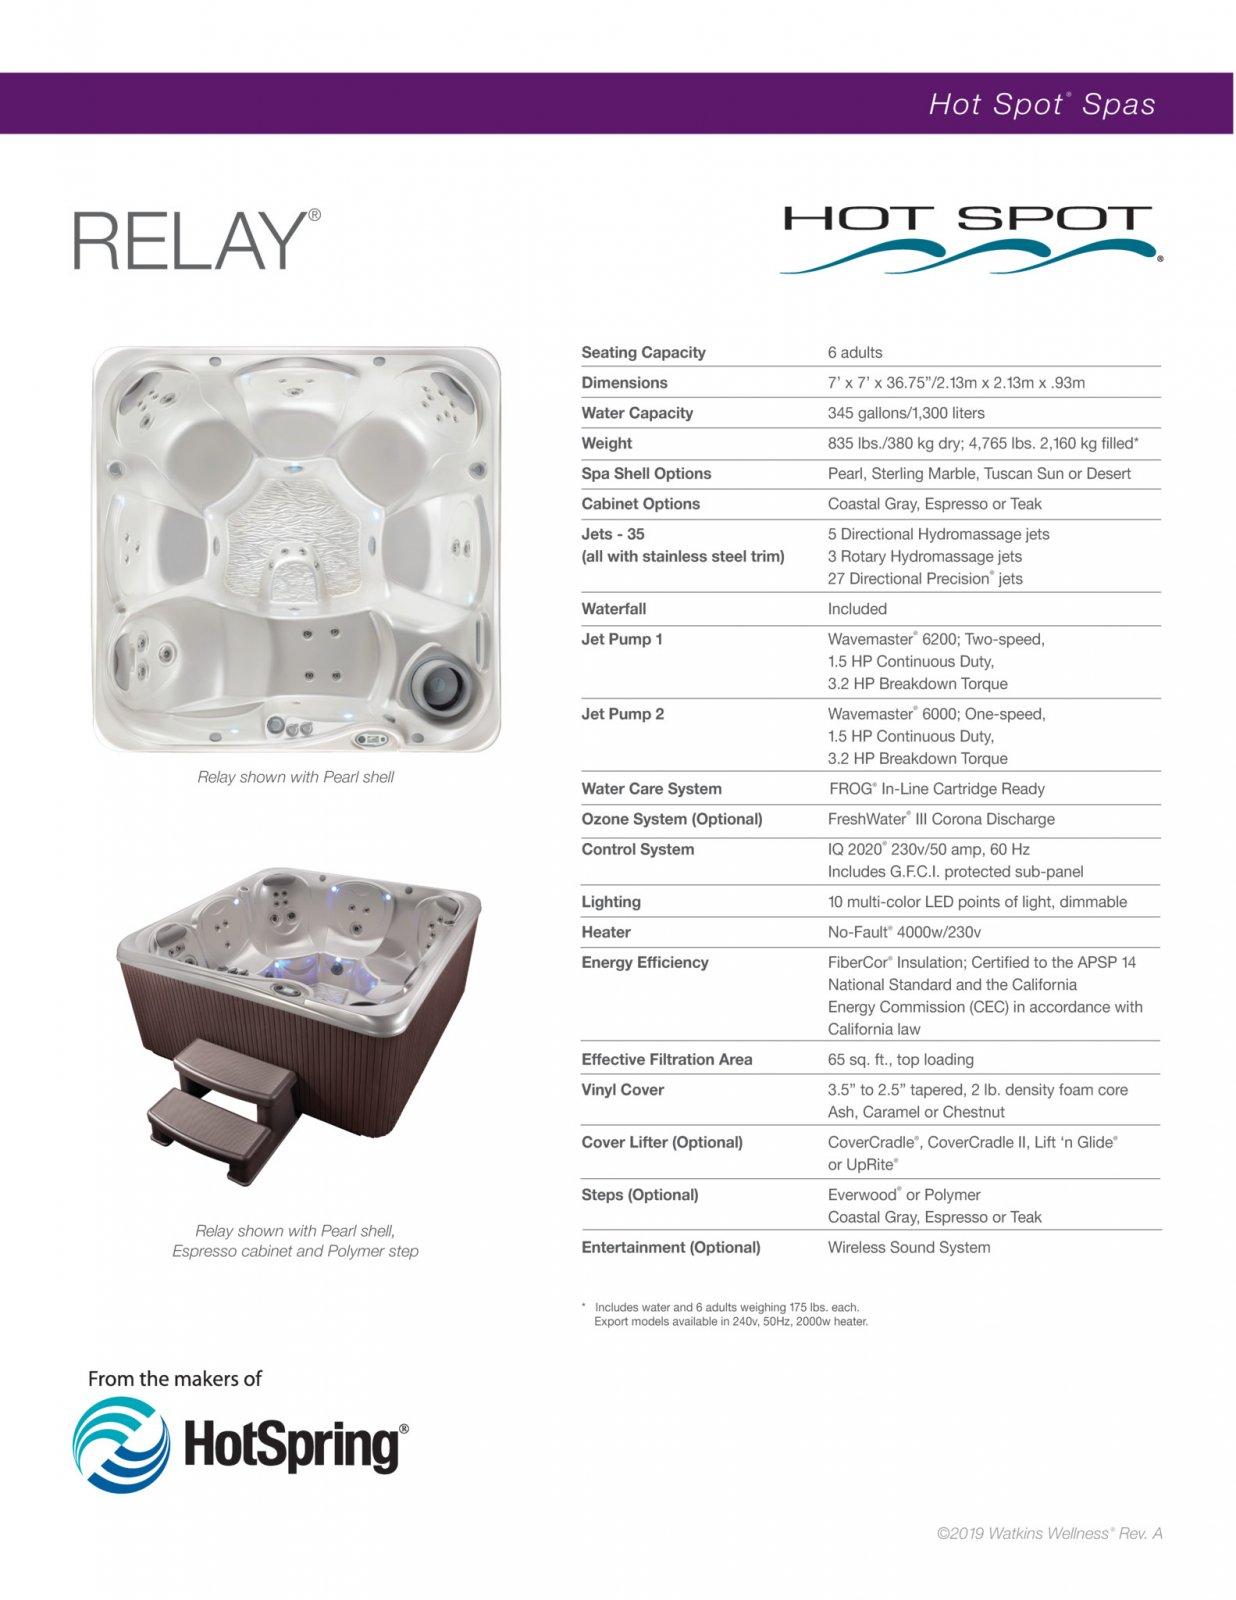 Hot Spot Relay Specs